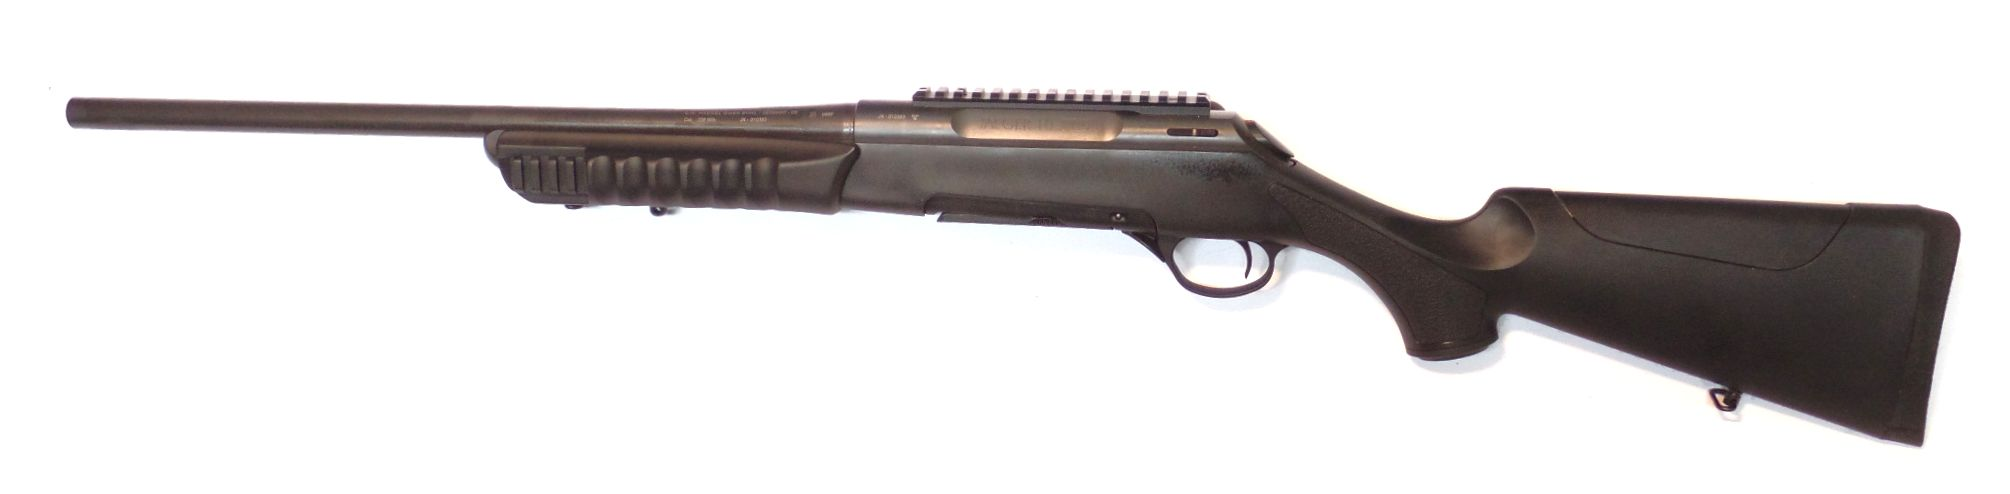 HAENEL Jaeger 10VSP calibre 308Winchester